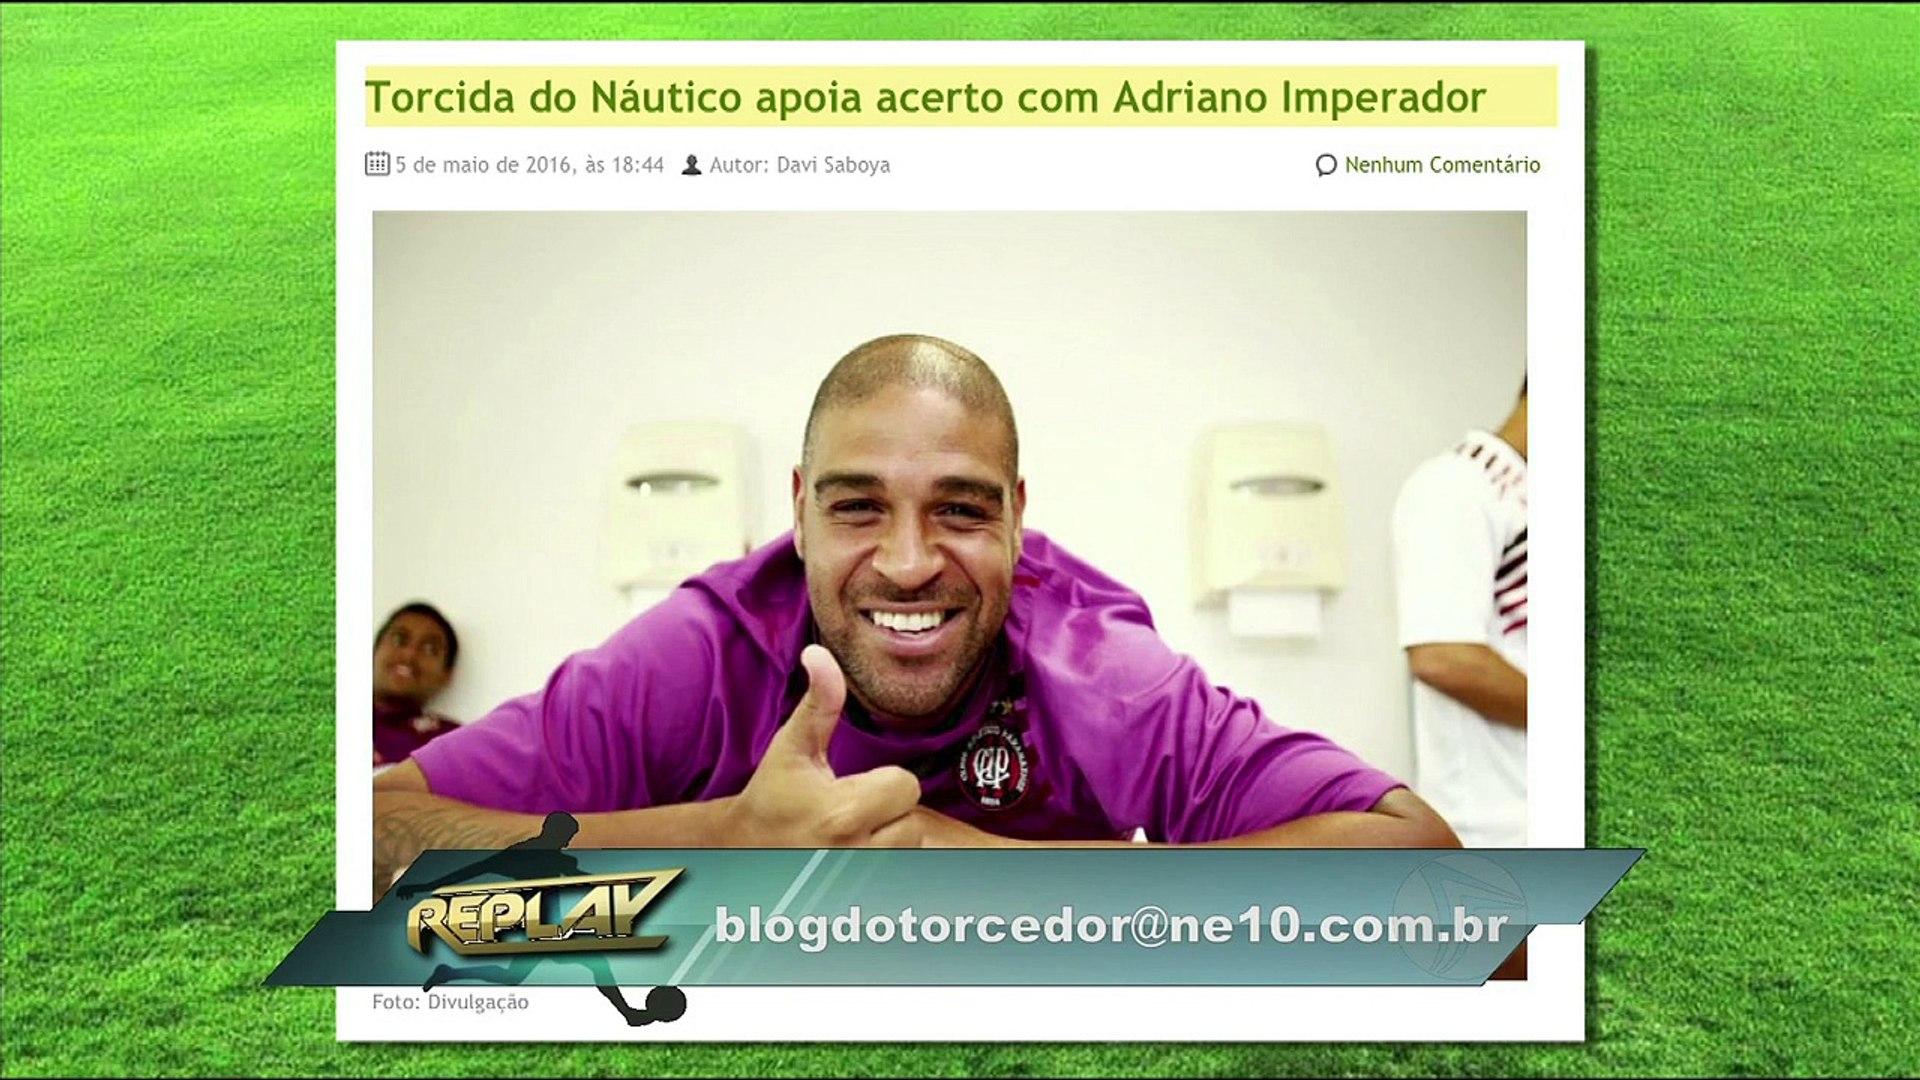 Replay - Adriano Imperador sondado no Náutico - Aroldo Costa comenta 06 05 16 TV Jornal-SBT